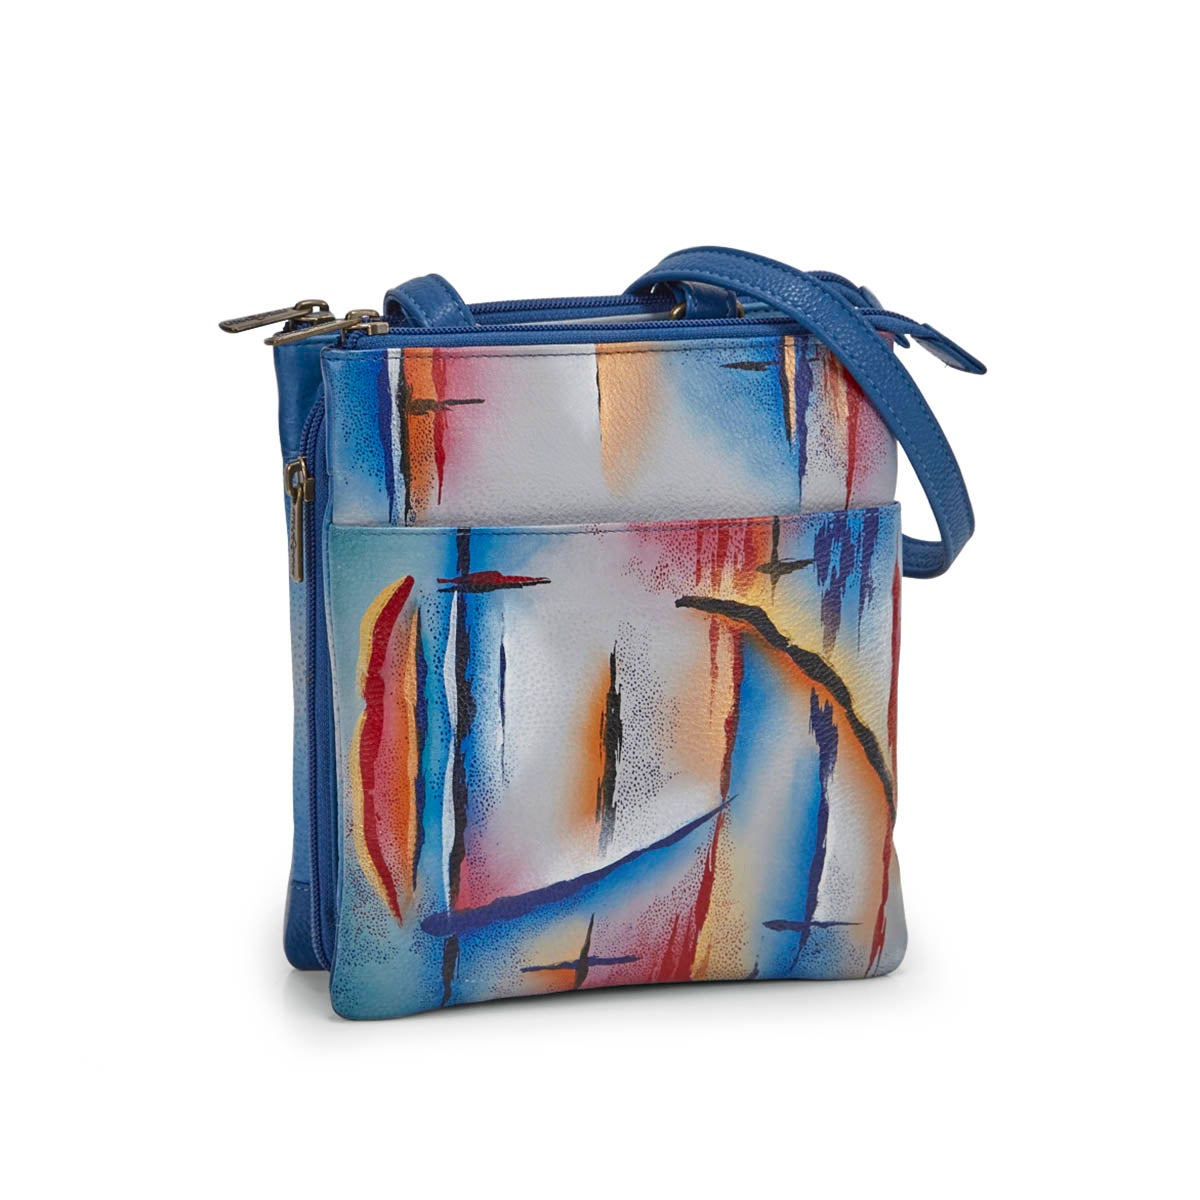 Women's NORTHERN SKIES crossbody bag